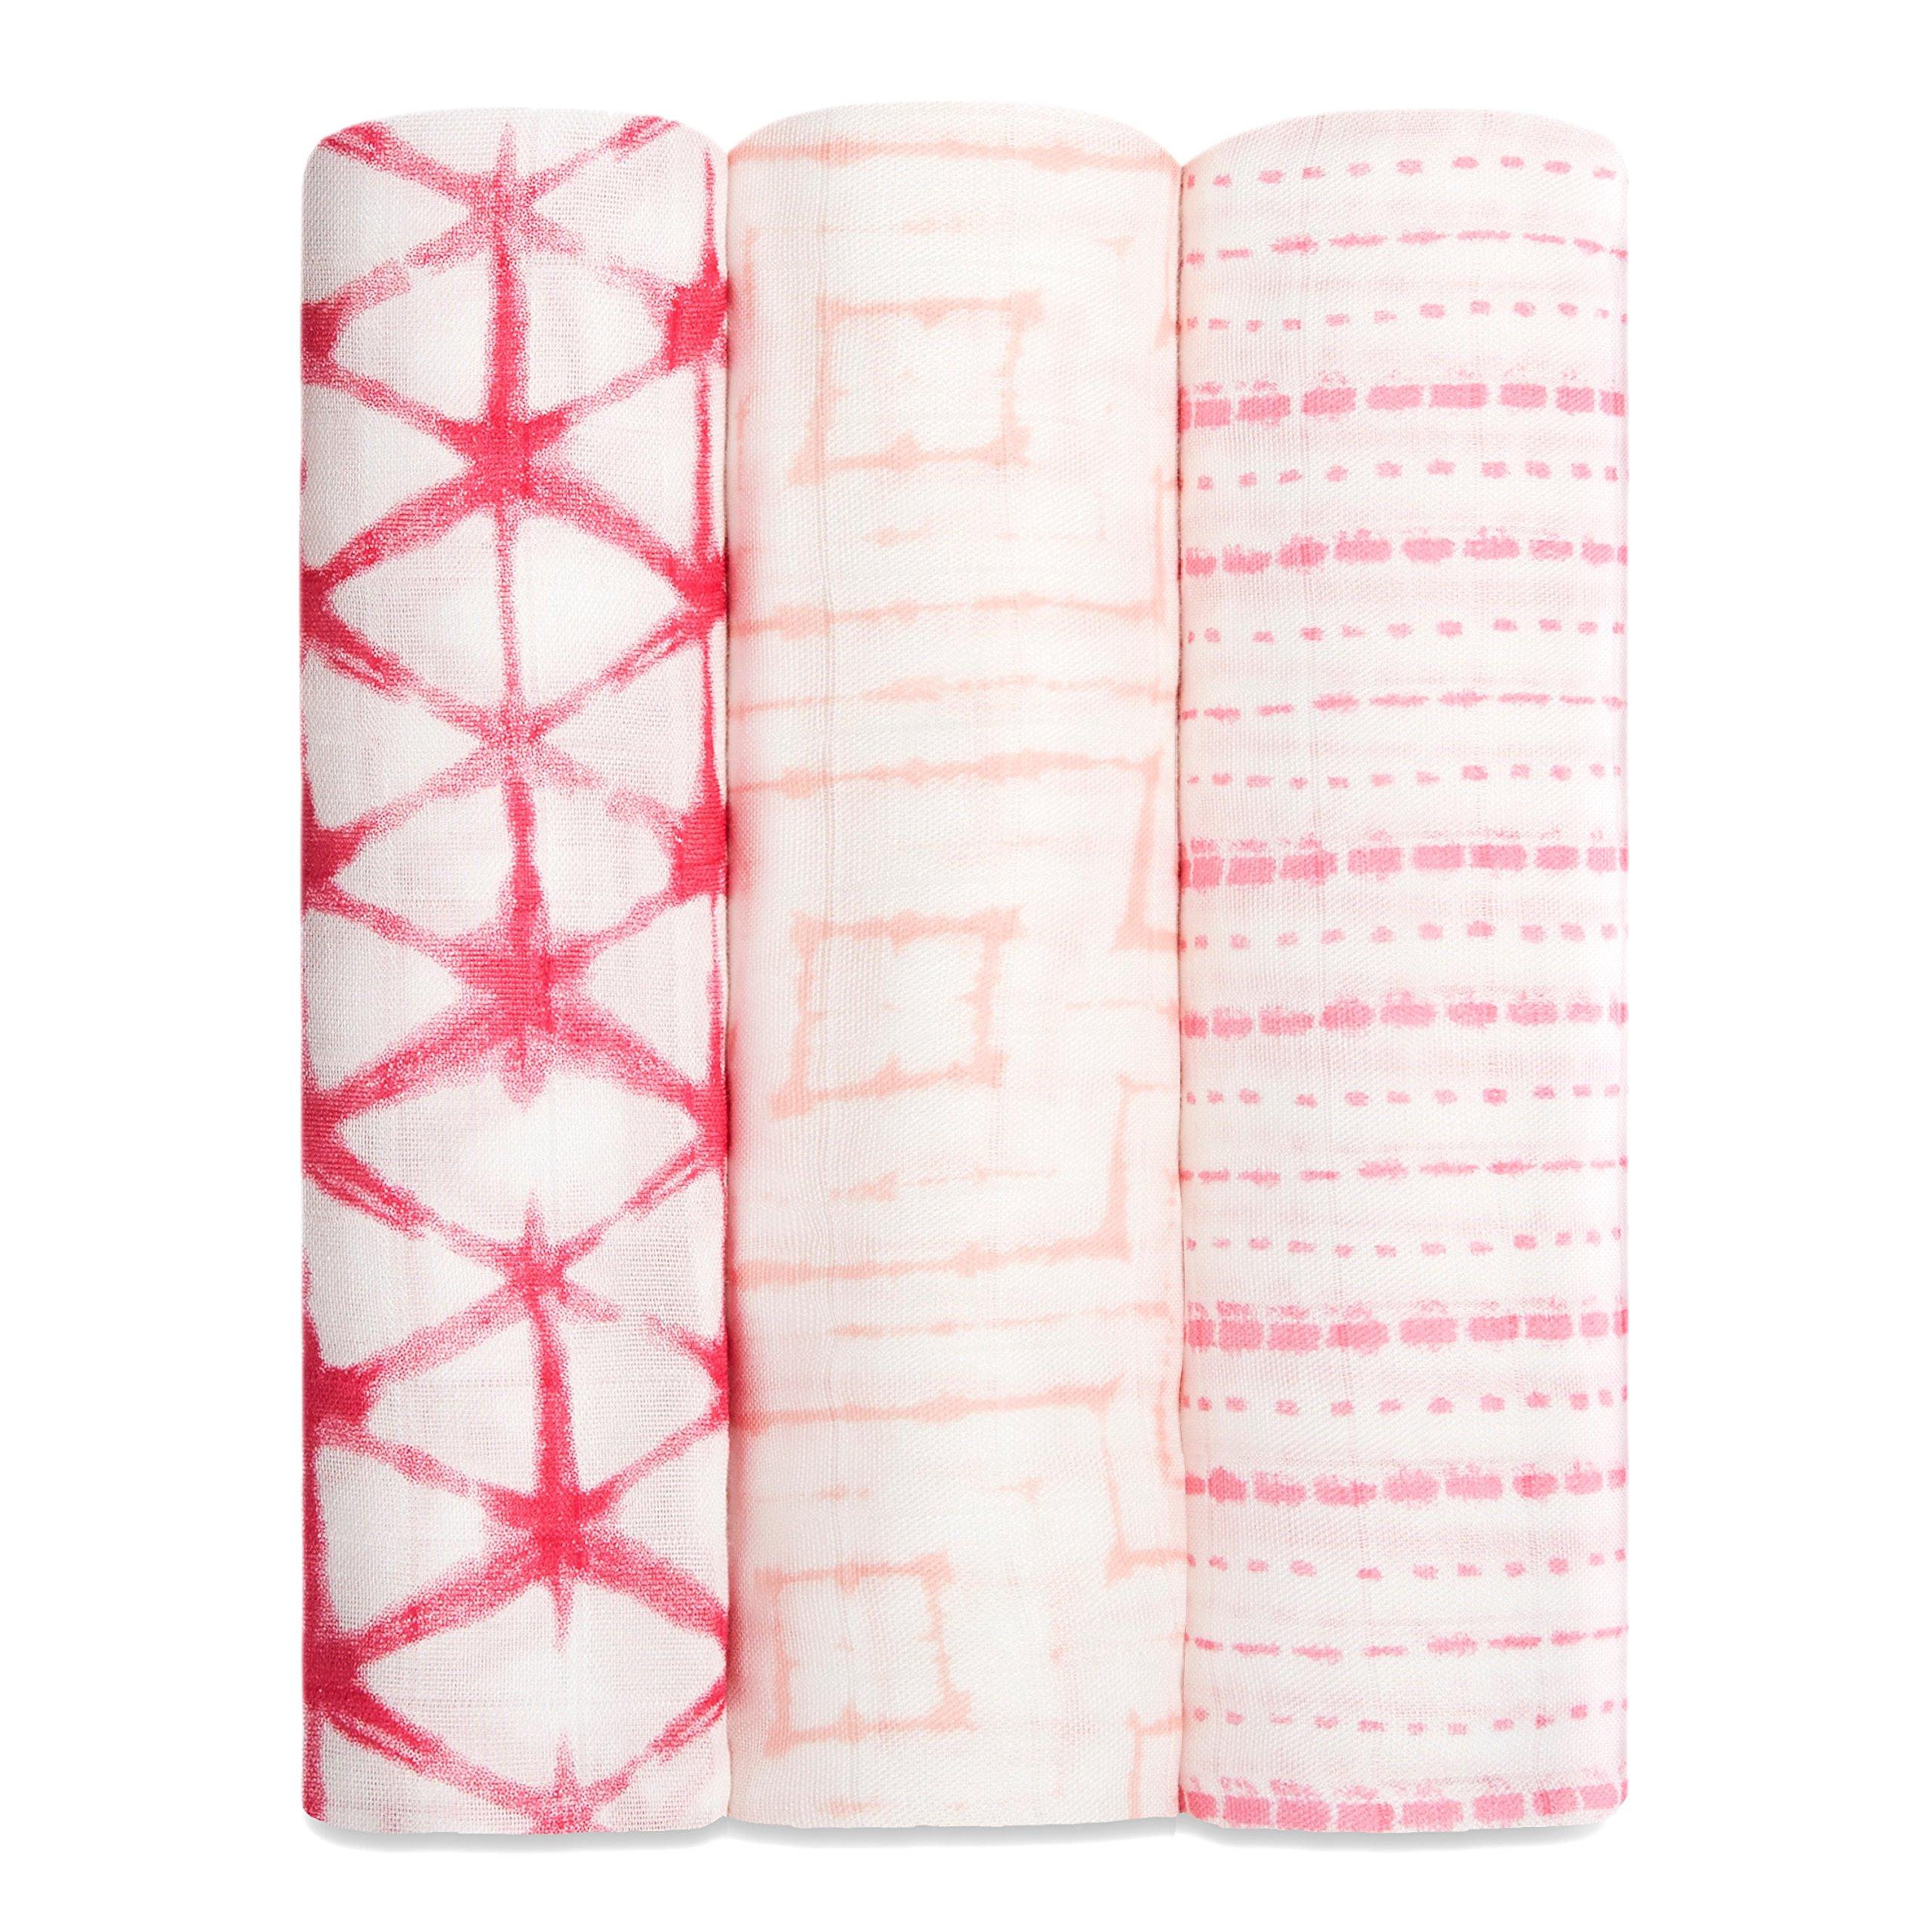 aden + anais silky soft swaddle 3 pack, berry shibori